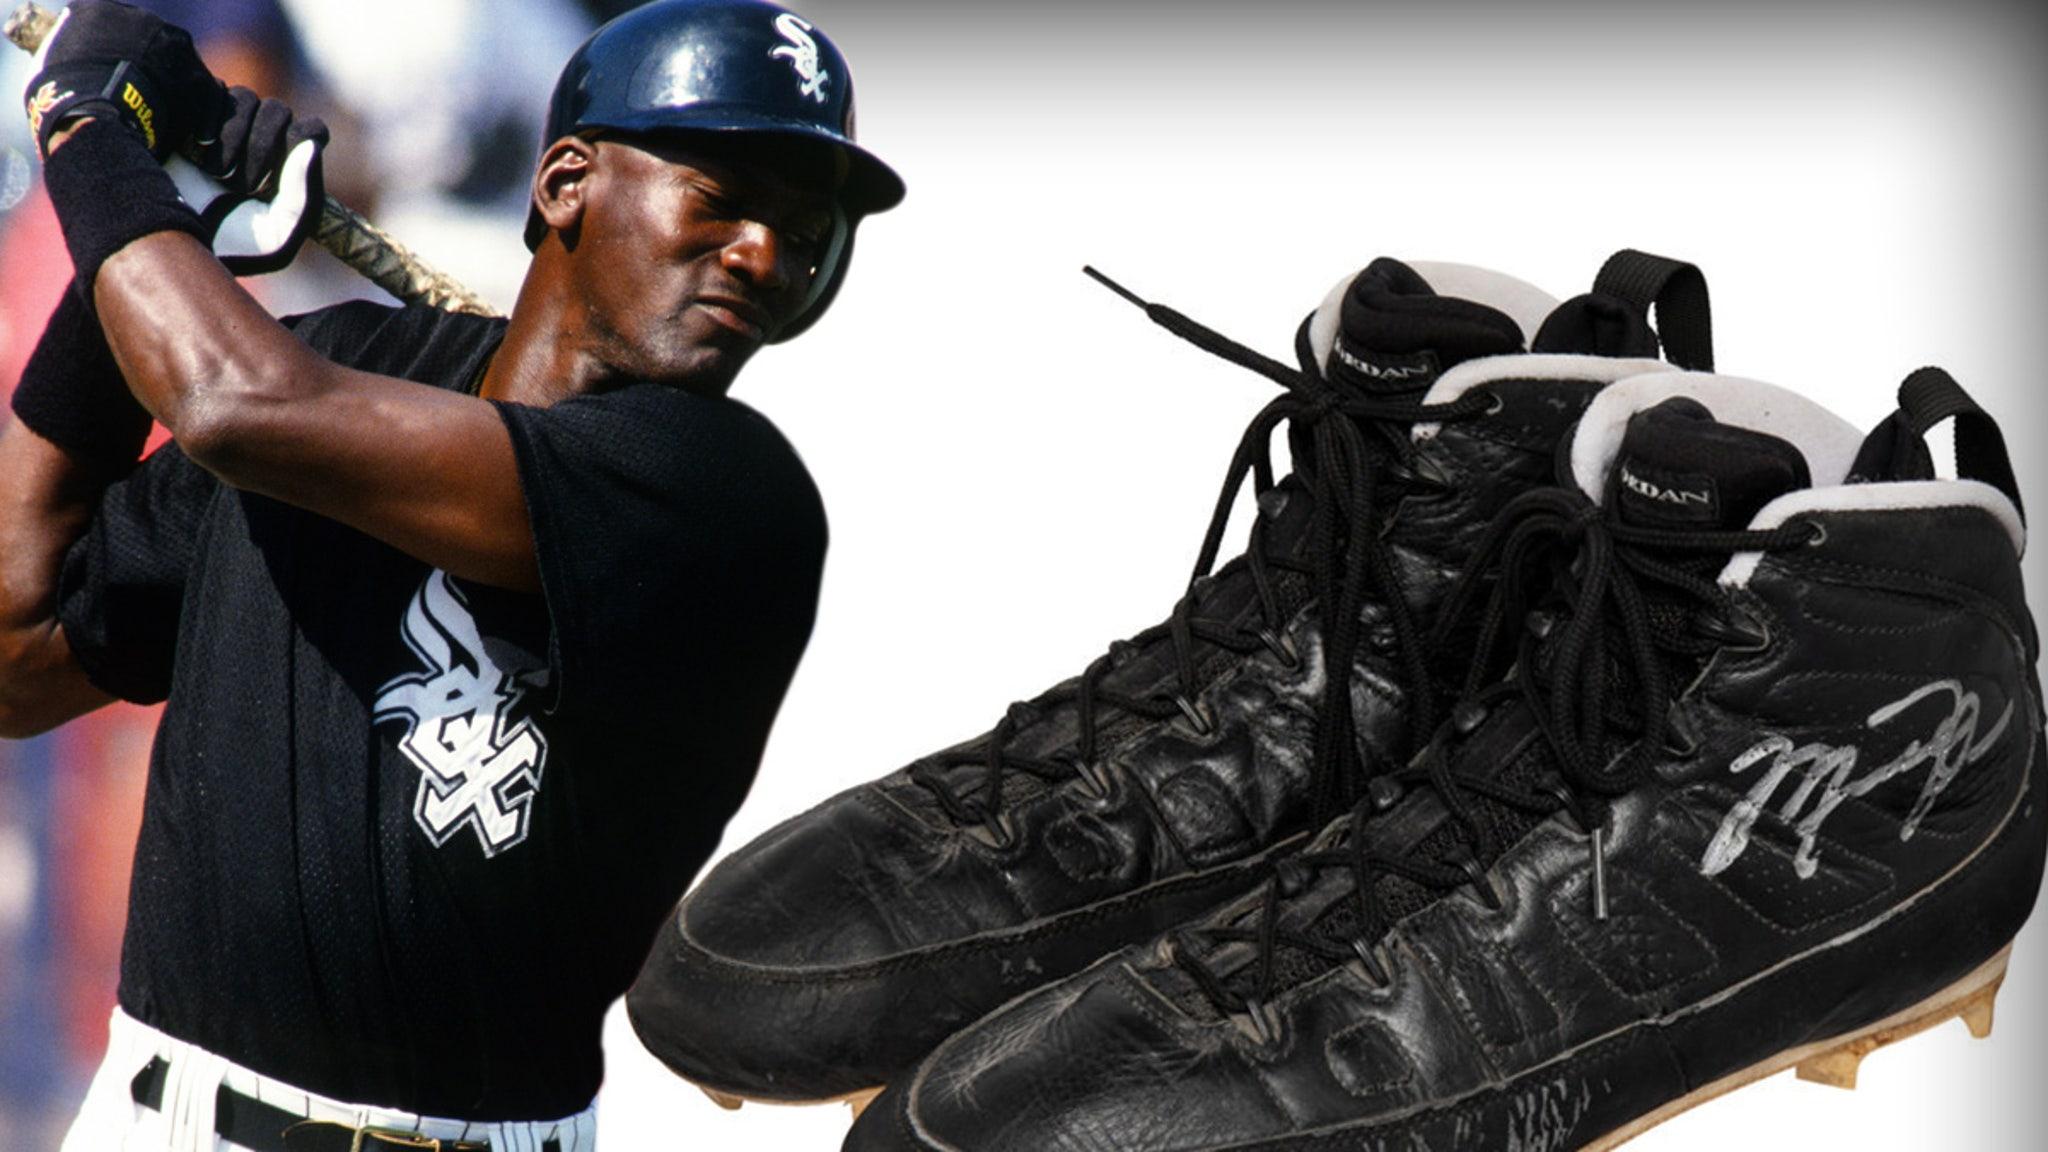 Michael Jordan-Worn, Signed Baseball Cleats Sell for $93k